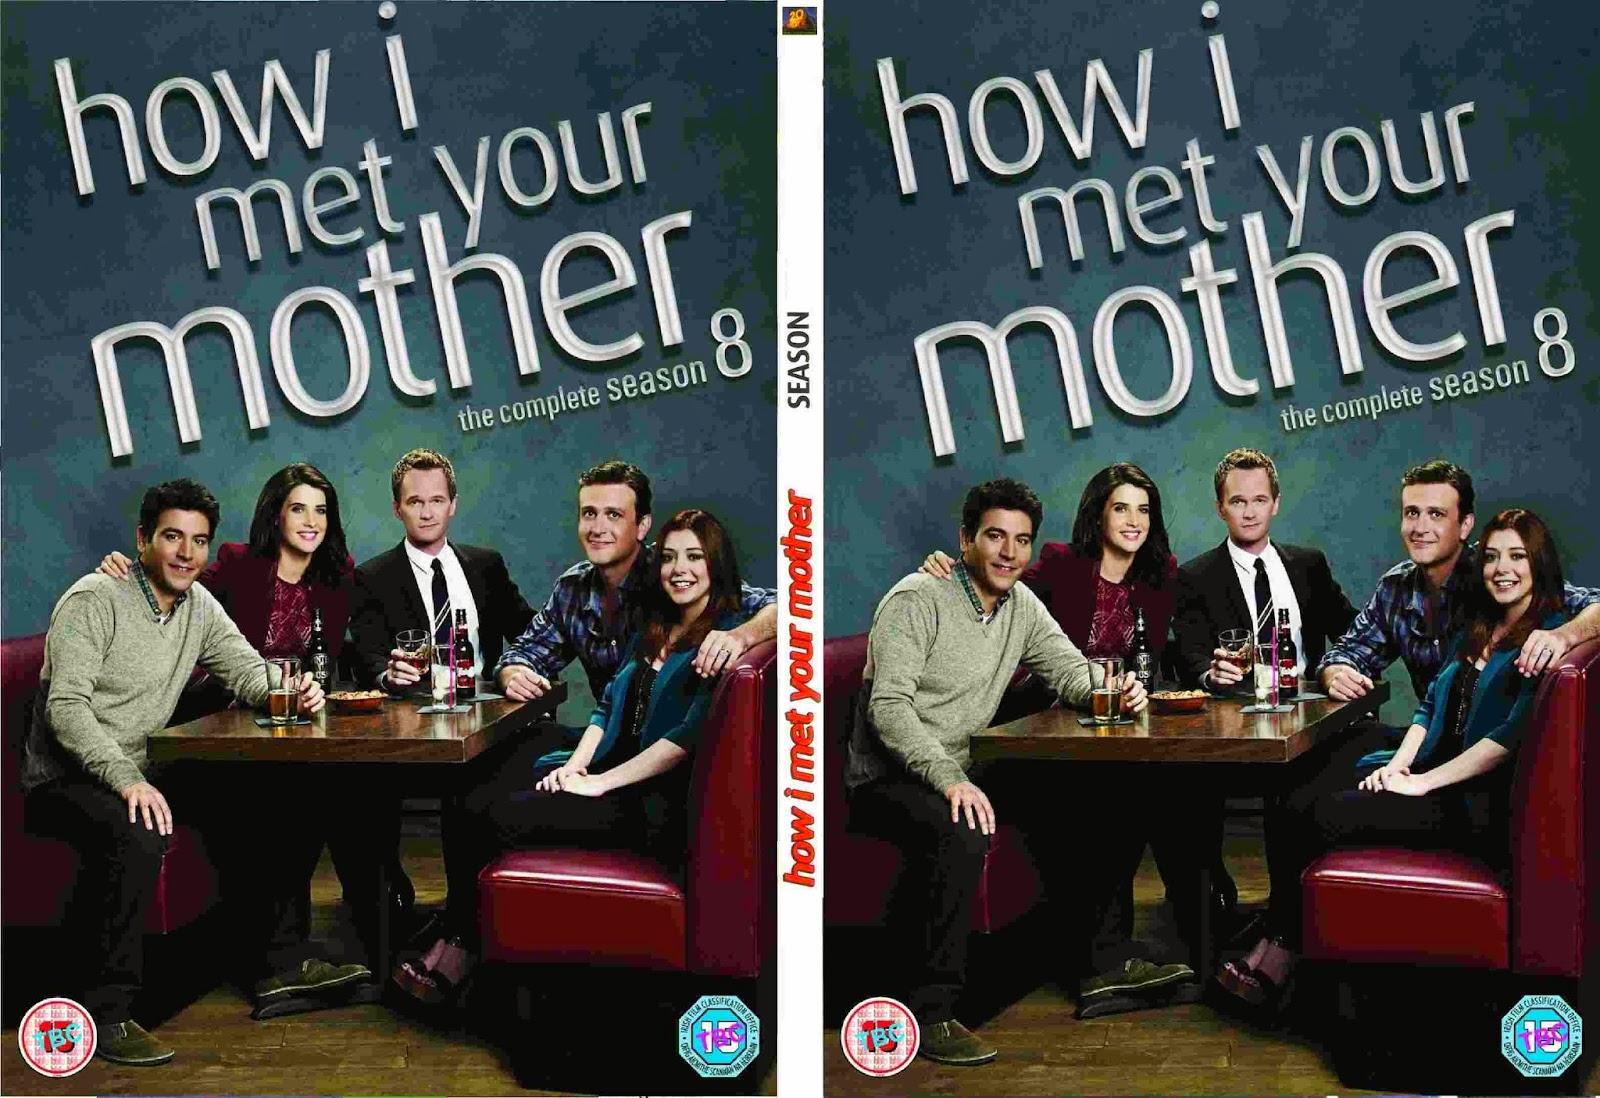 Joe manganiello how i met your mother season 8